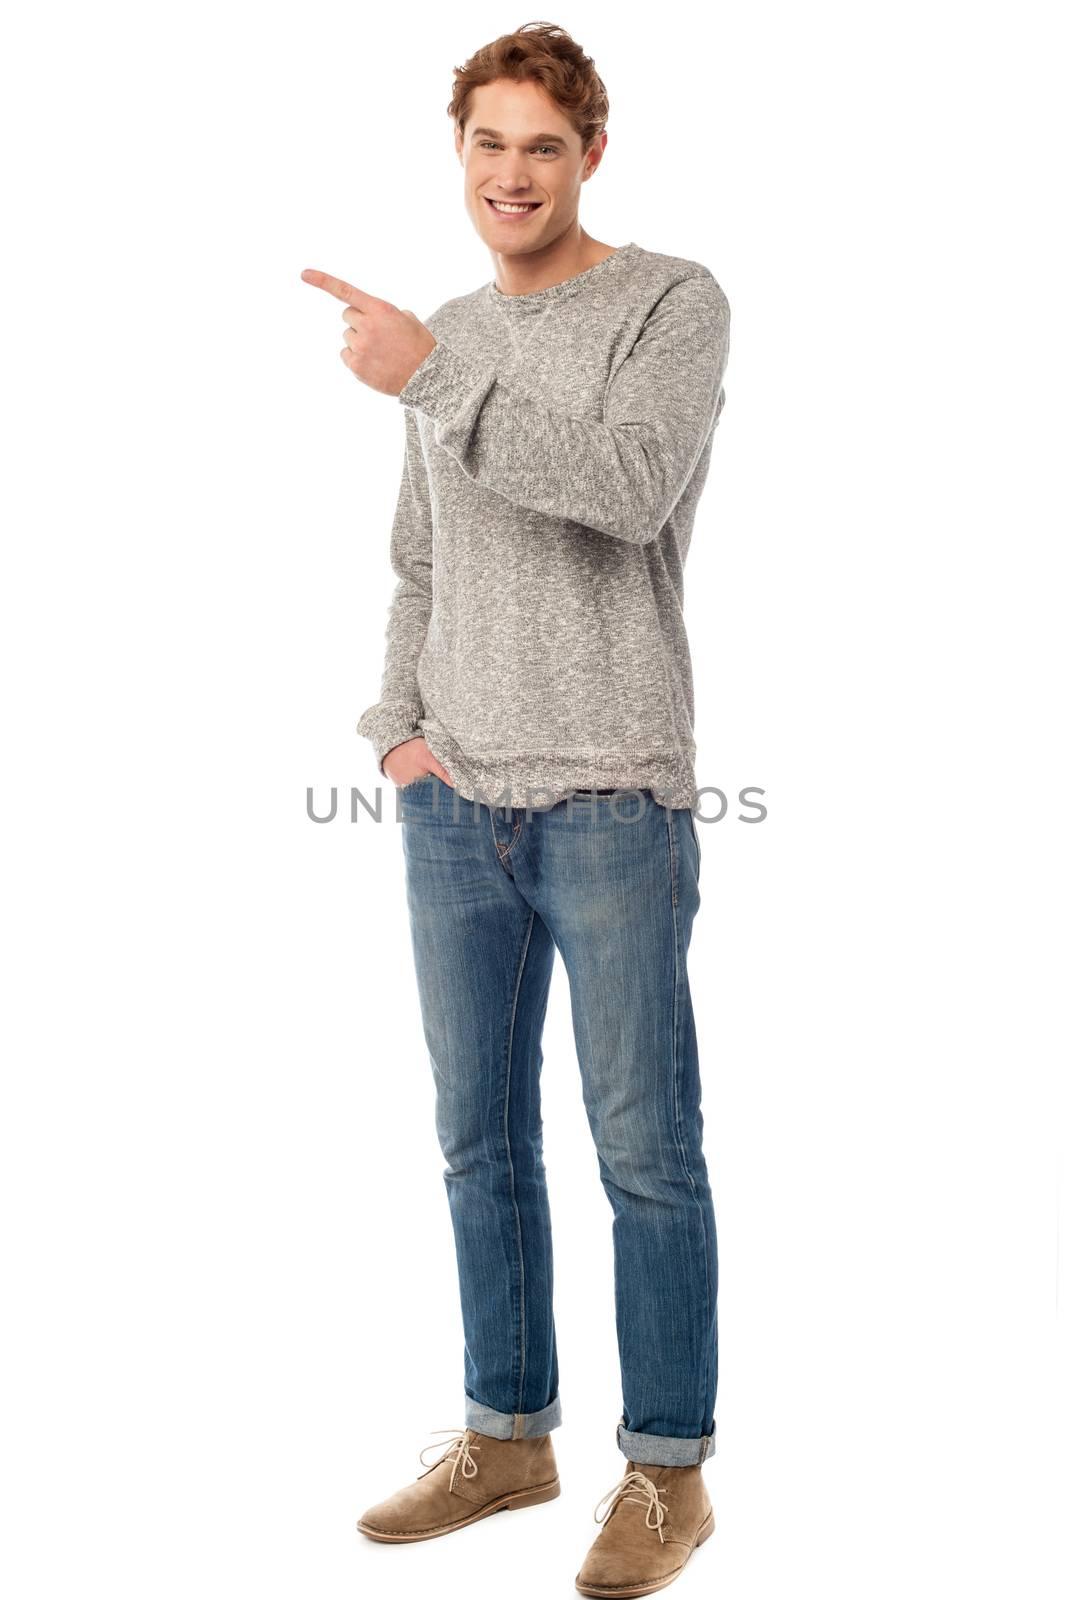 Fashion guy pointing at something